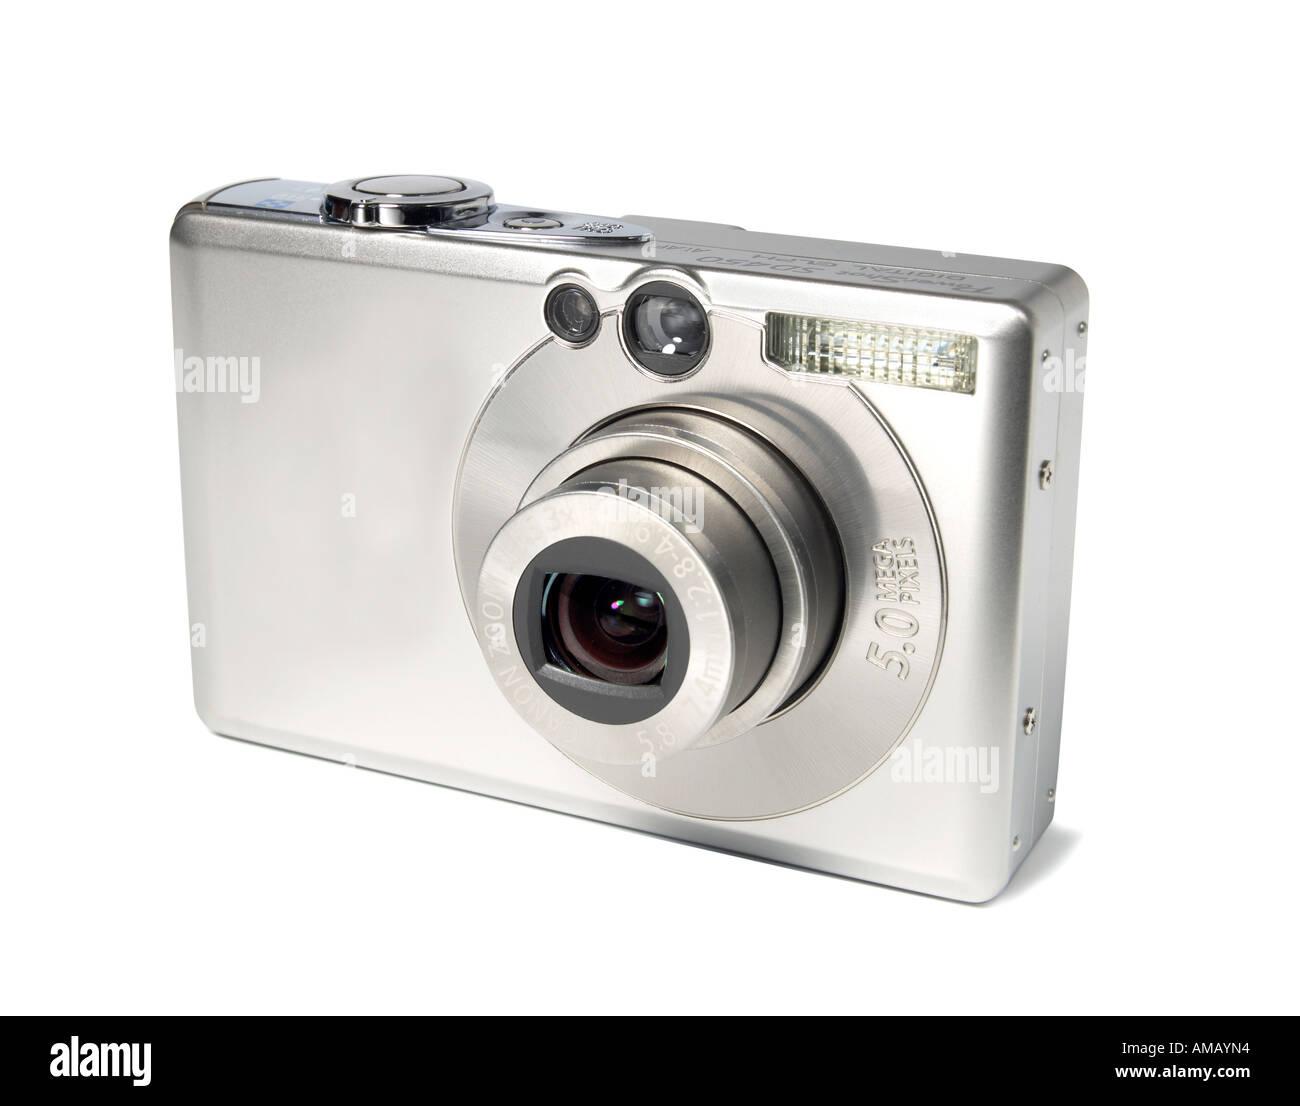 Digital camera - Stock Image